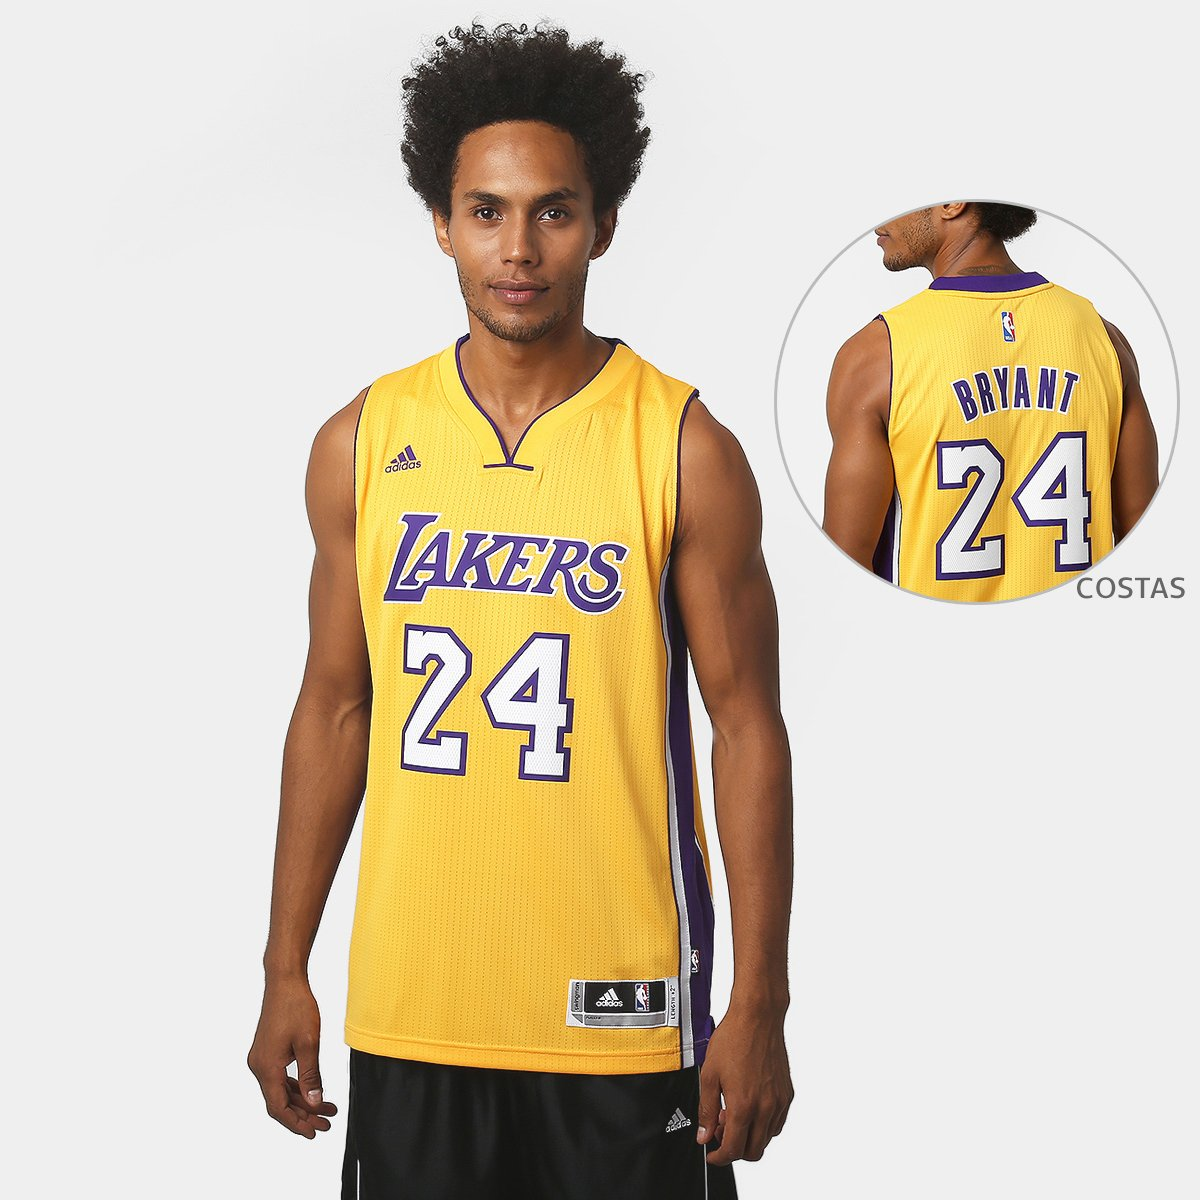 f577fe085def Camiseta Regata NBA Adidas Swingman Los Angeles Lakers - Kob - Compre Agora